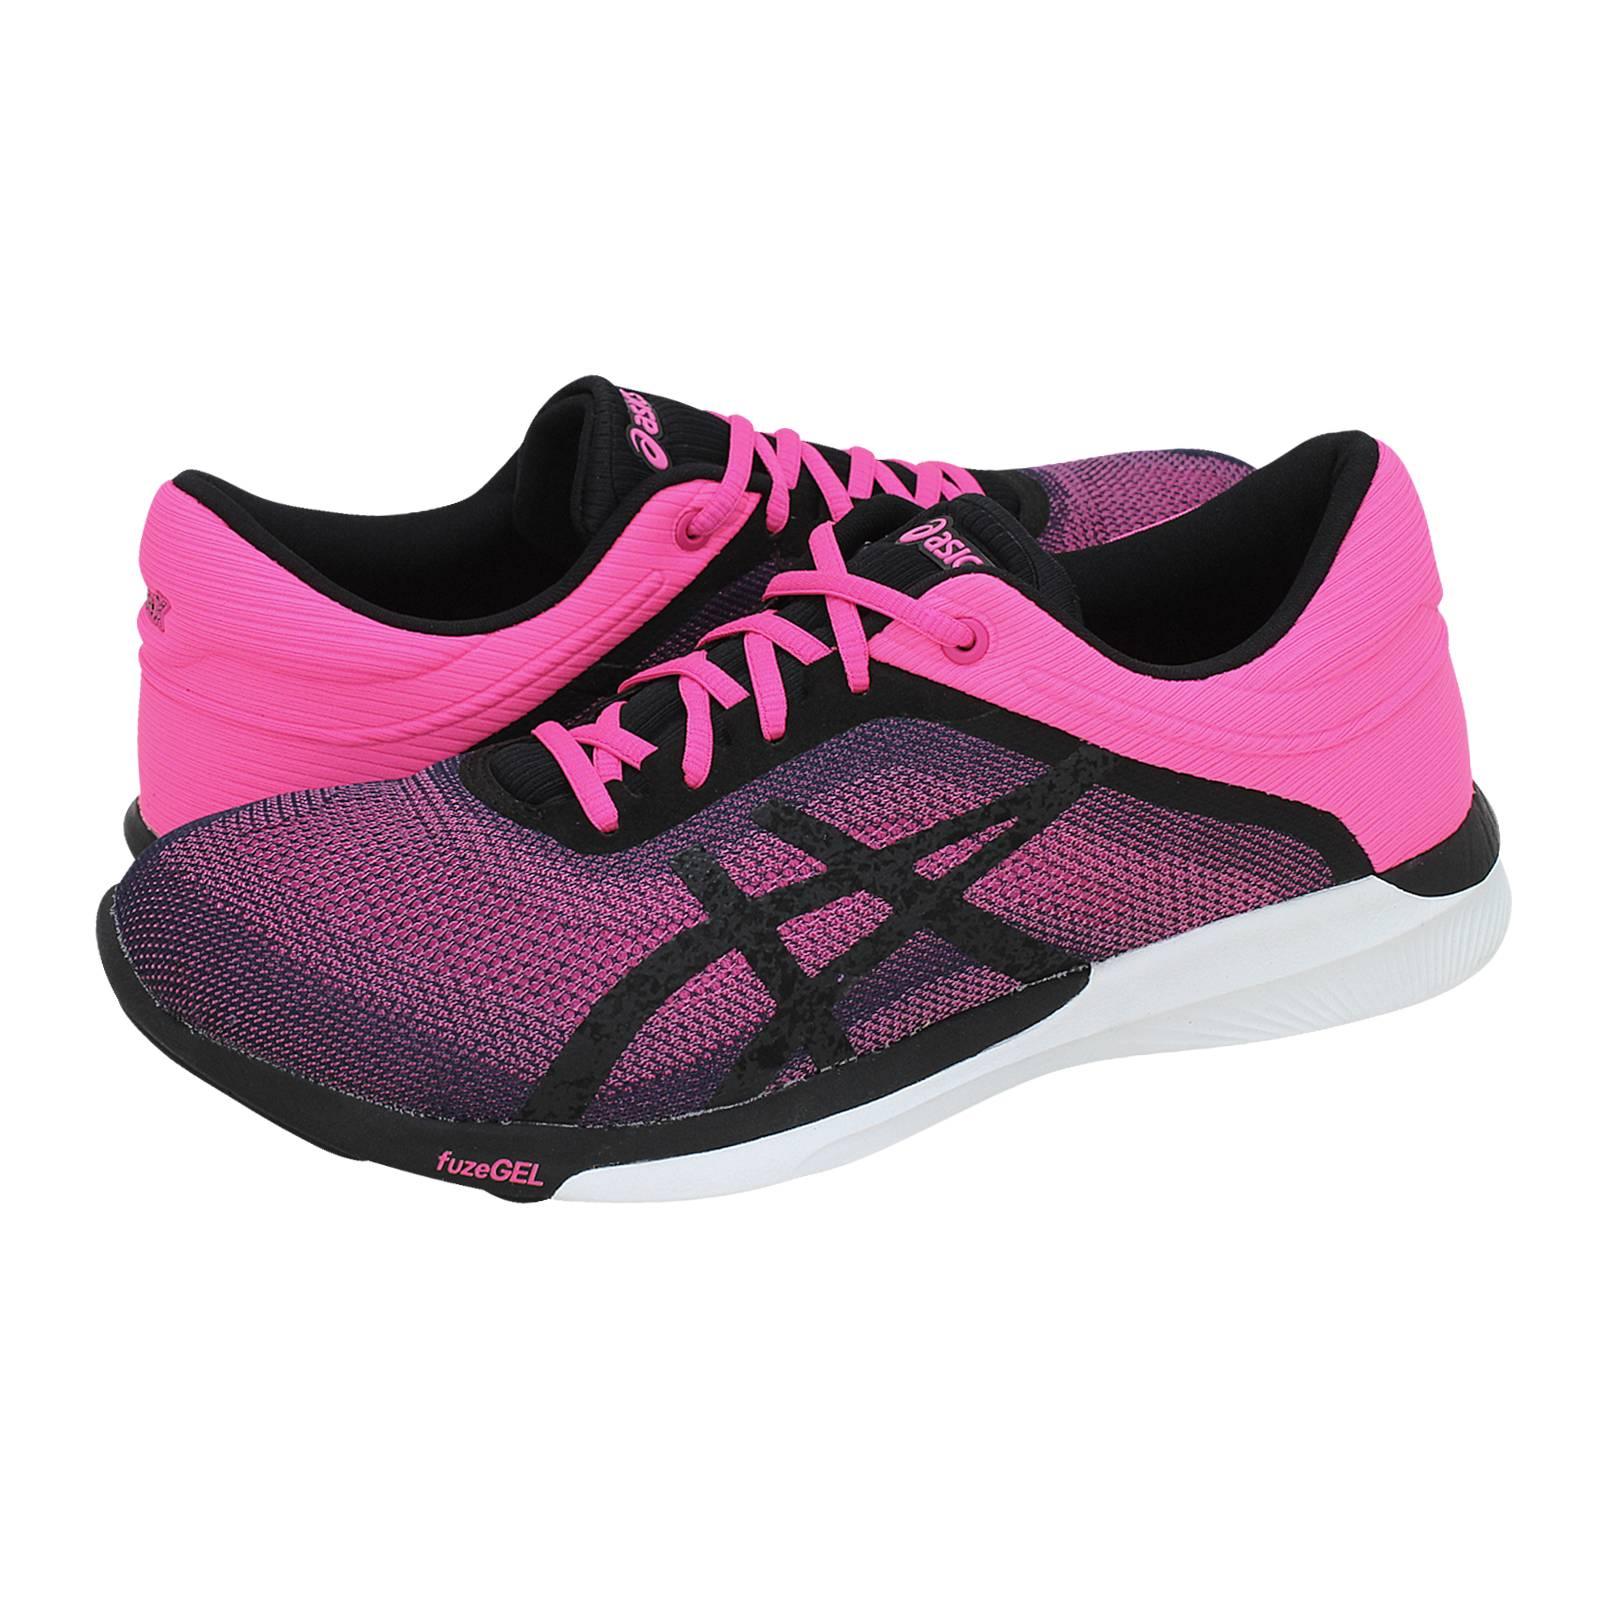 FuzeX Rush - Γυναικεία αθλητικά παπούτσια Asics από υφασμα και ... d36ac5a6148